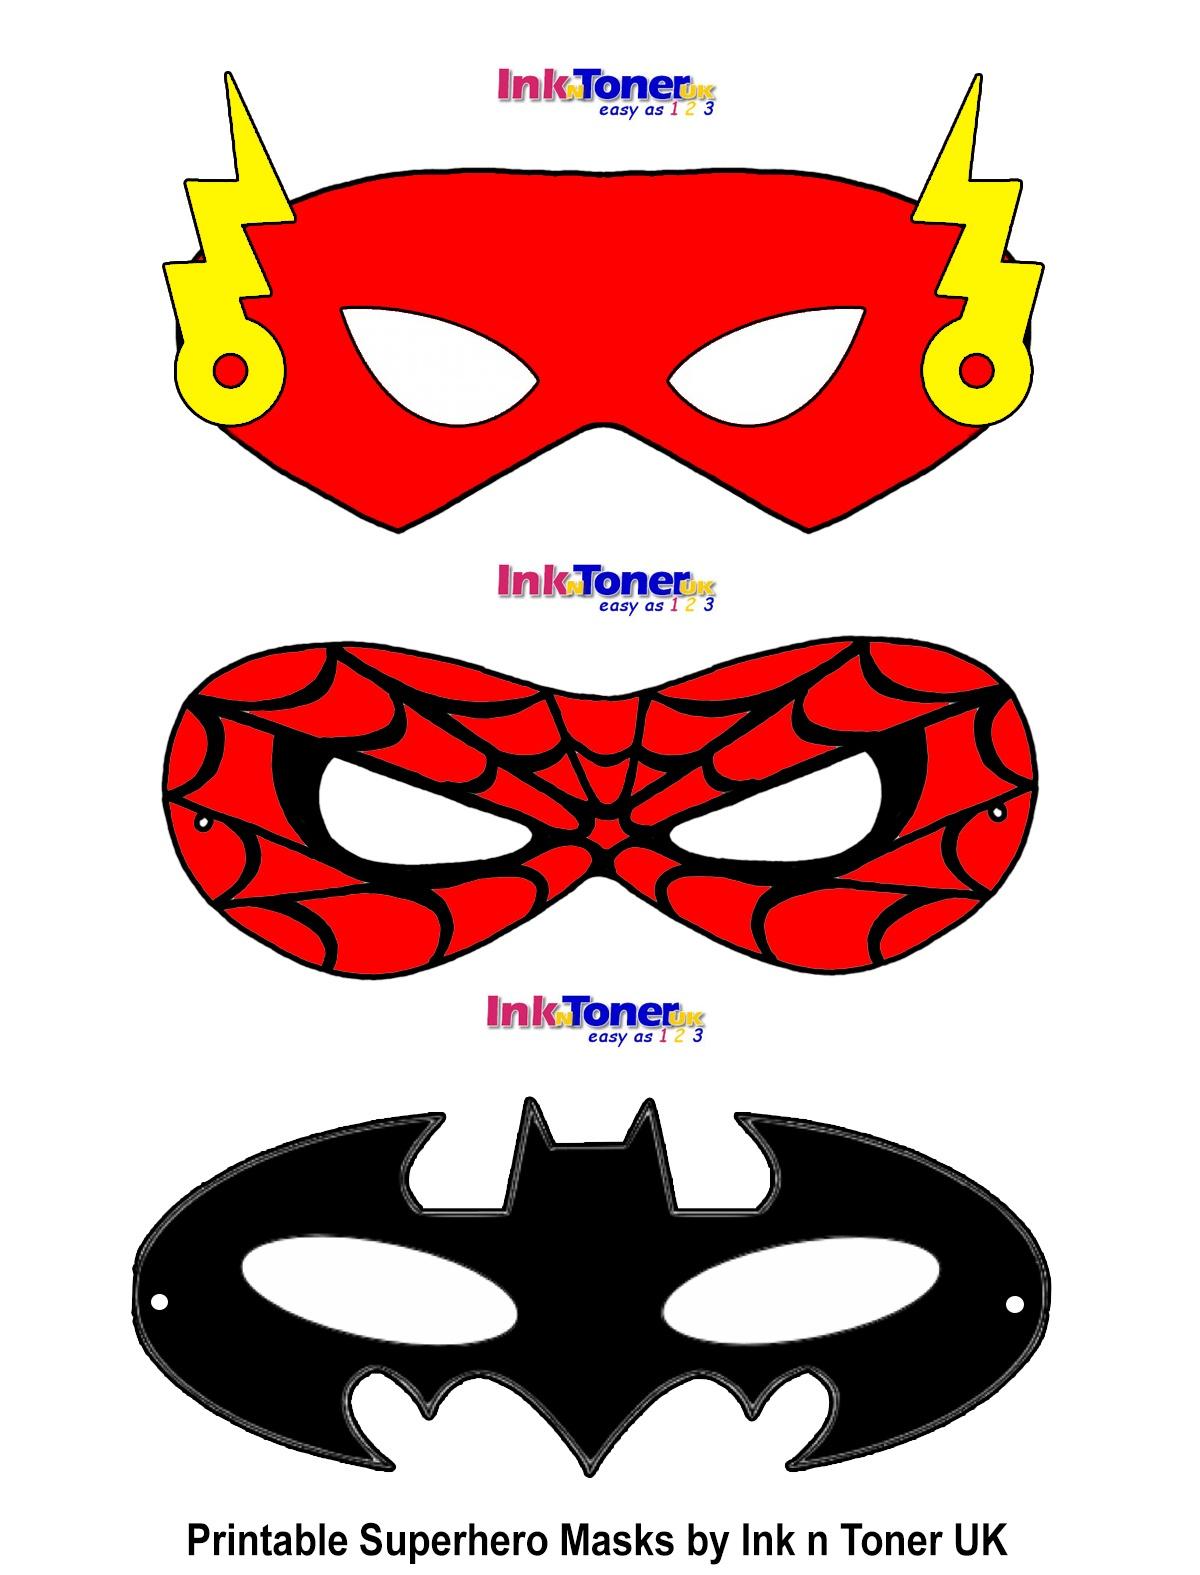 Printable Superhero Masks For Super Hero Day | Inkntoneruk Blog - Free Printable Superhero Masks